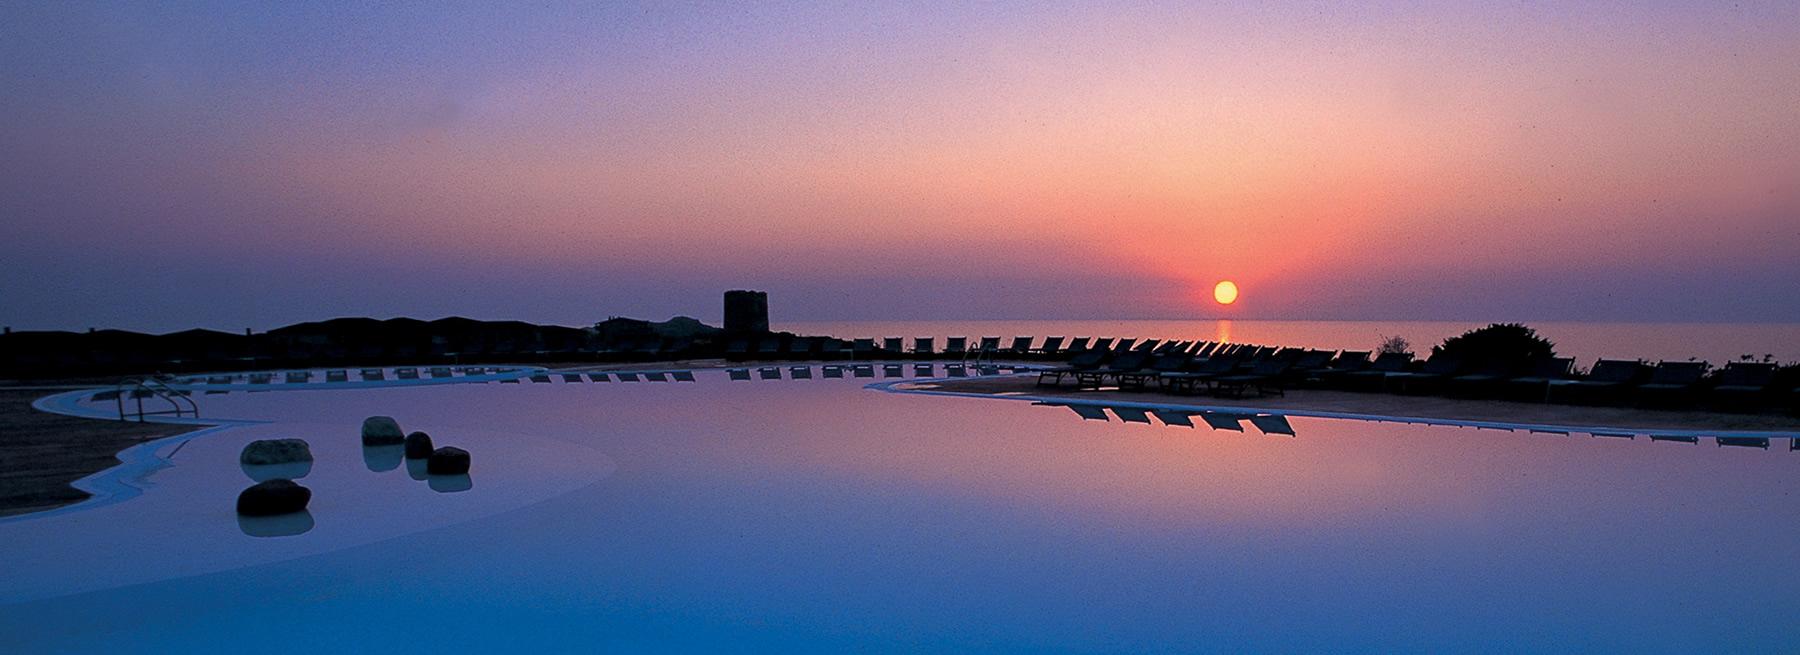 isola Rossa,Golfo dell'Asinara, nord Sardegna